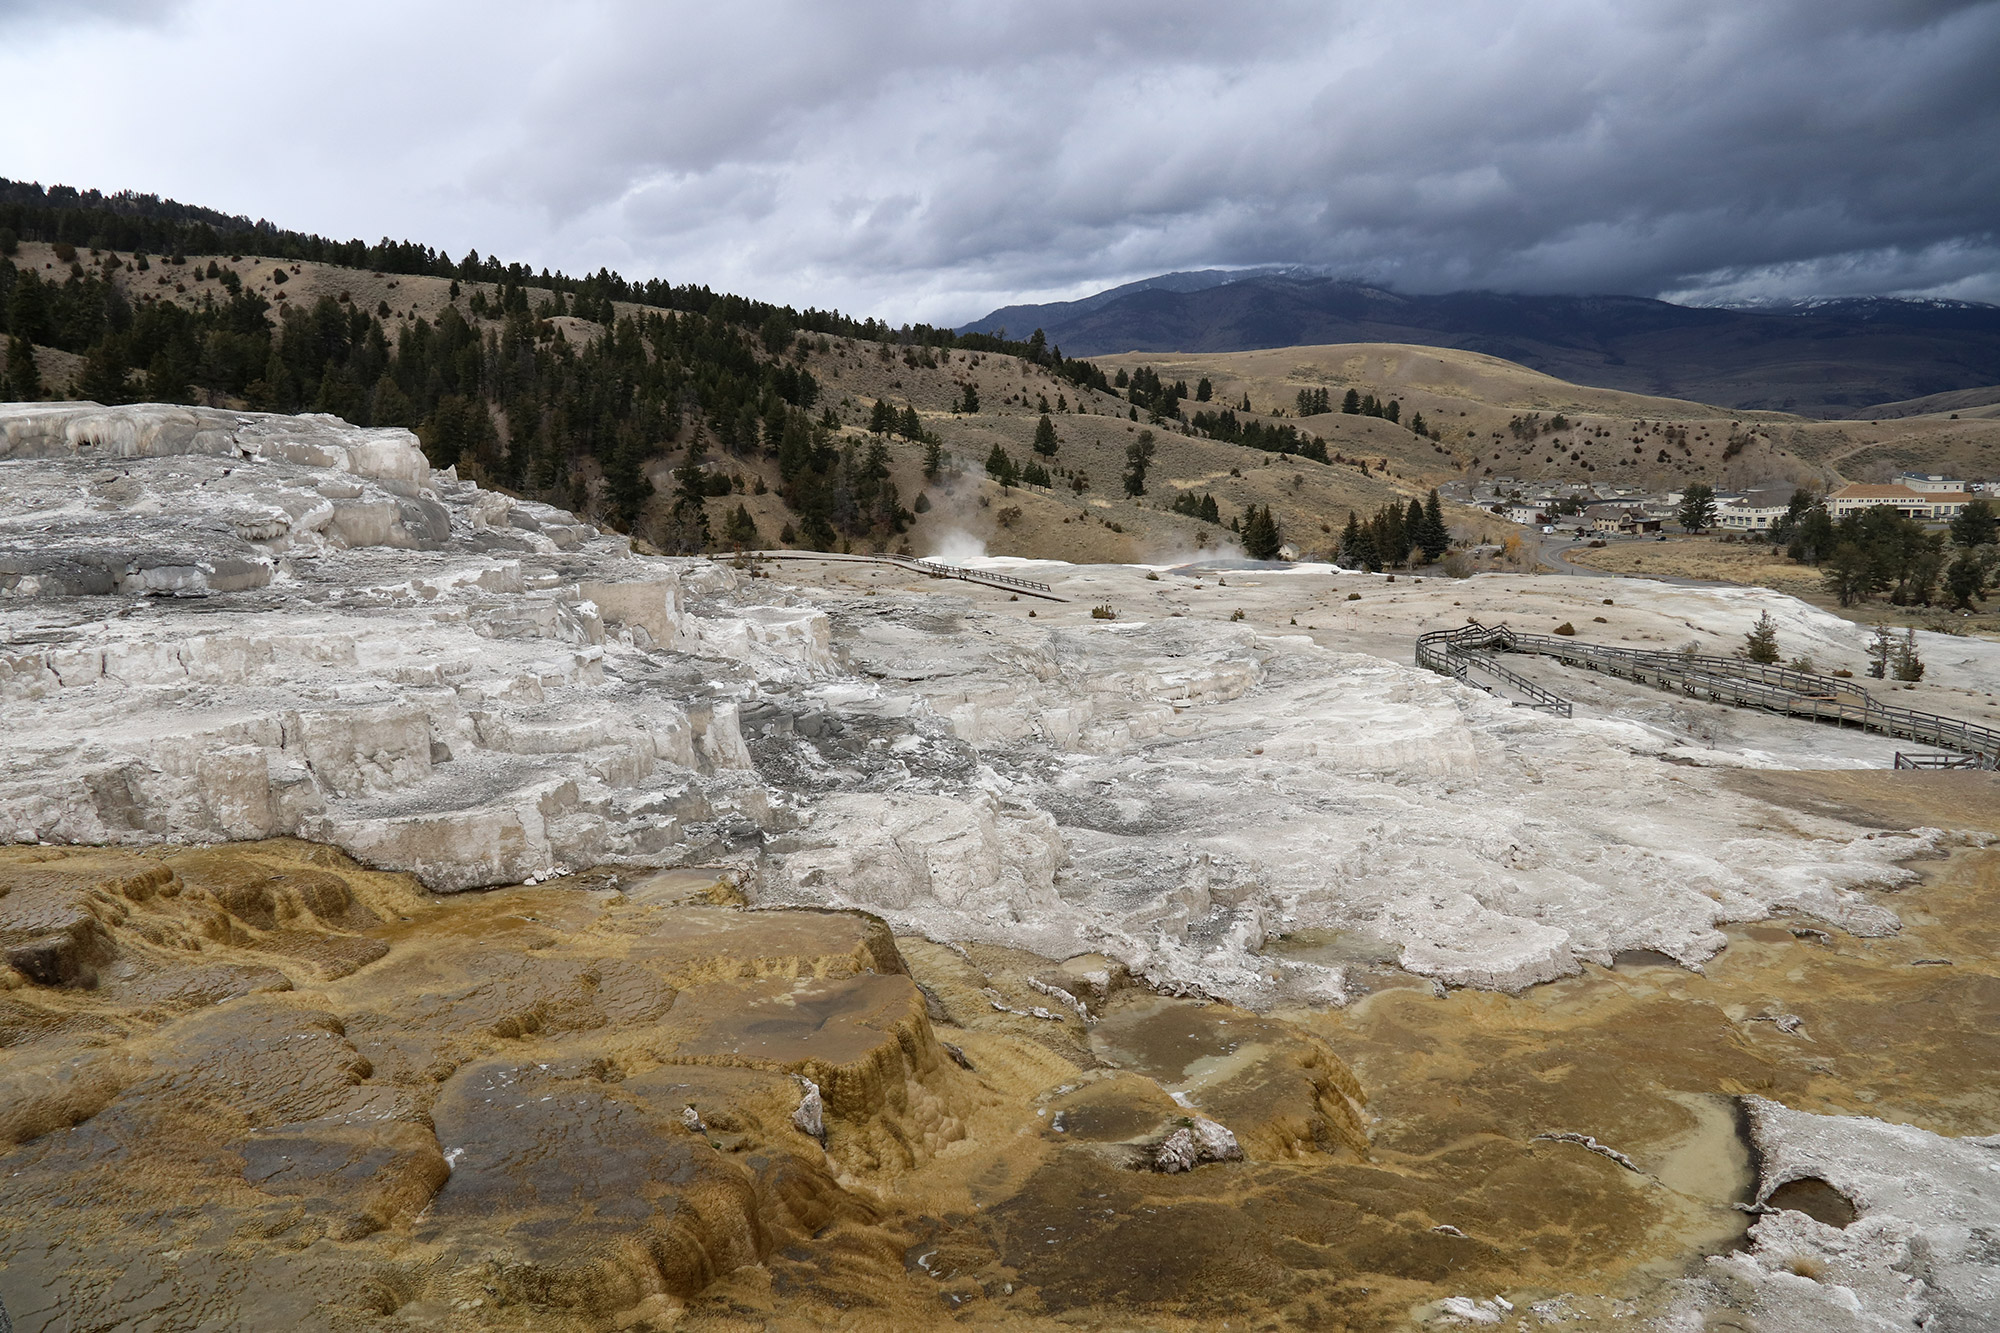 Amerika dag 4 - Yellowstone National Park - Mammoth Hot Springs - Lower Terrace